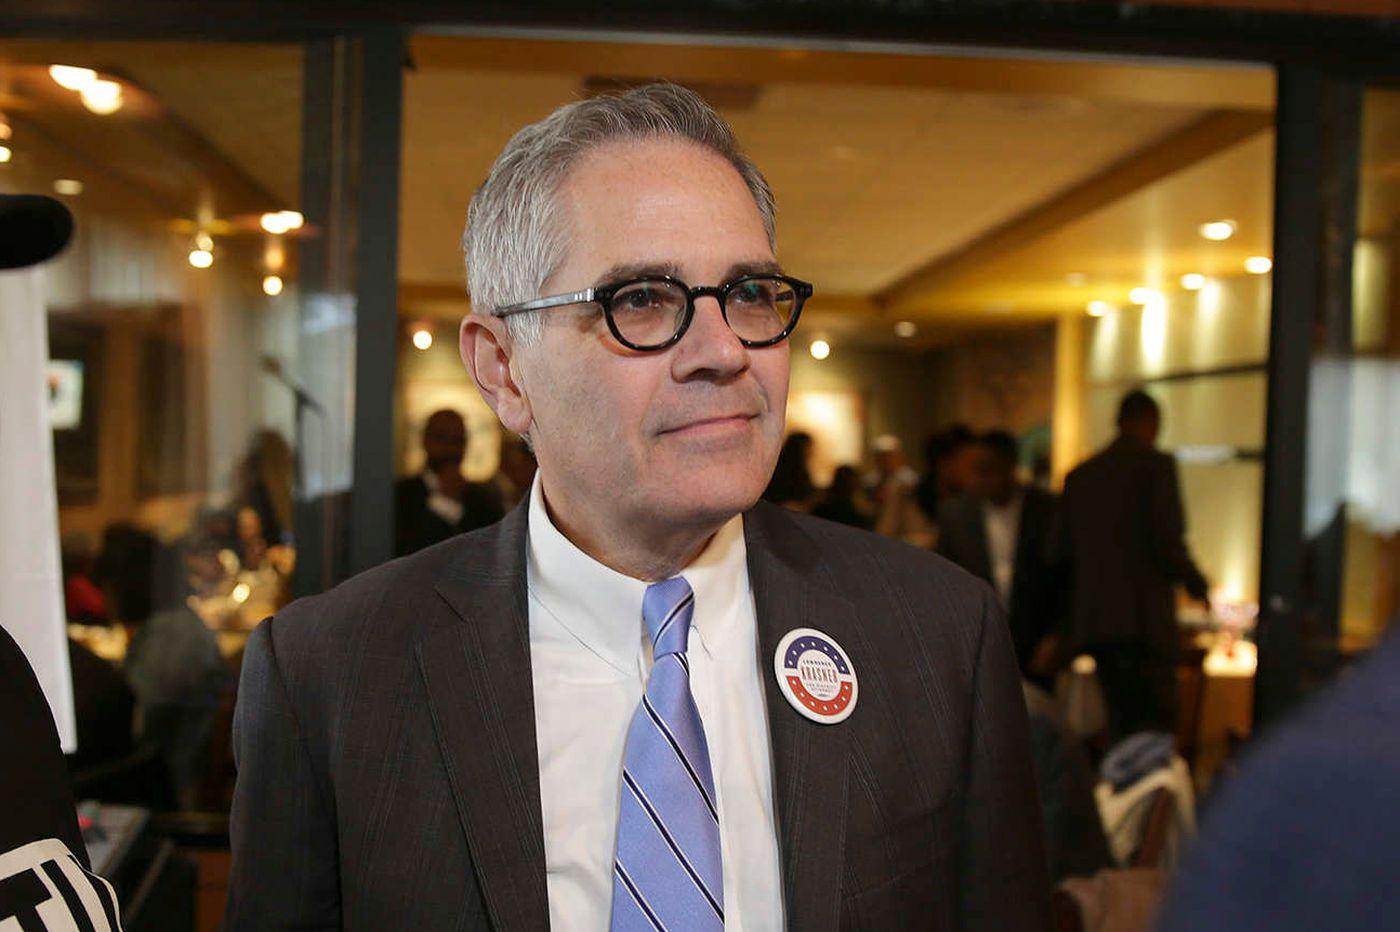 Philly DA Larry Krasner: We took on mass incarceration  Now